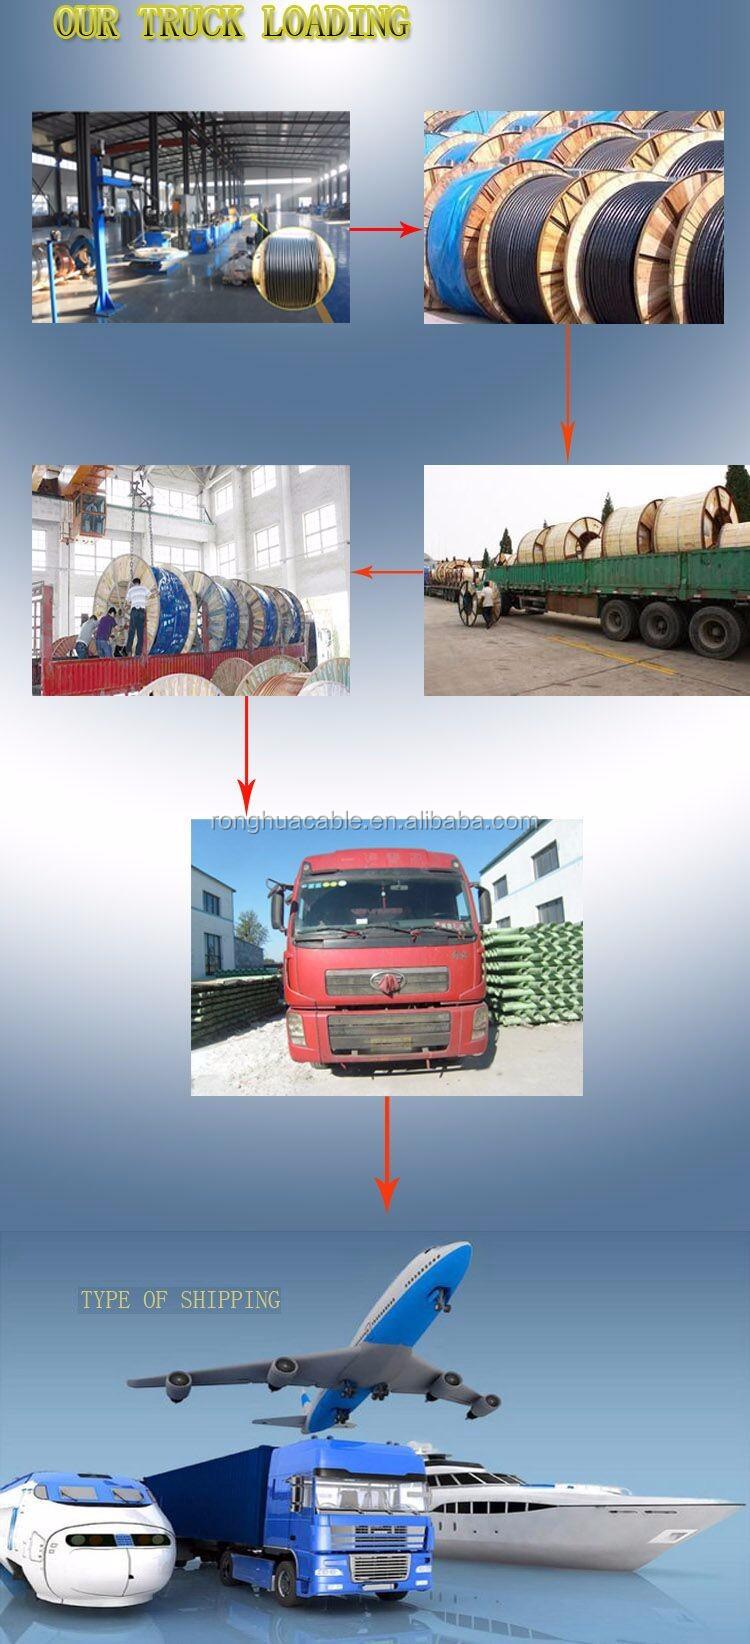 For Pakistan Cu Pvc Single Core 7 0029 Mm Electrical Wire 220 440v Flameretardant Flexible Copper Bv Bvvb Bvr